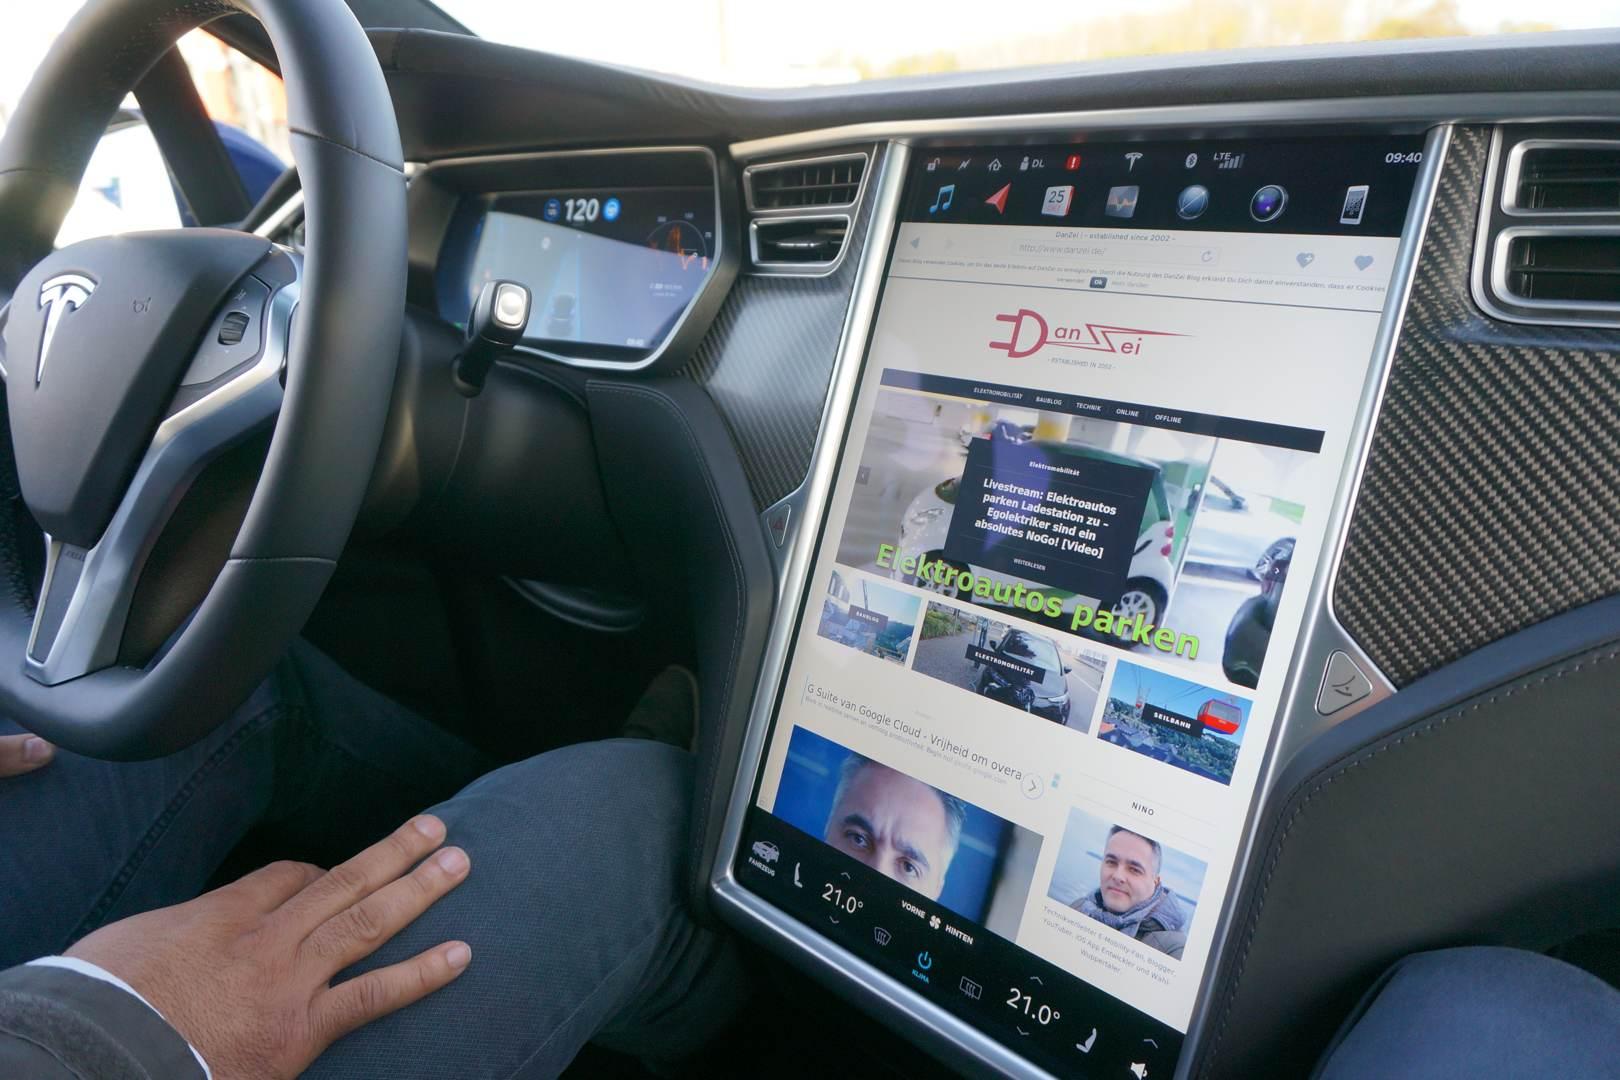 Tesla_Tilburg_Factory_Tour_Autopilot_Website_Browser_DanZei